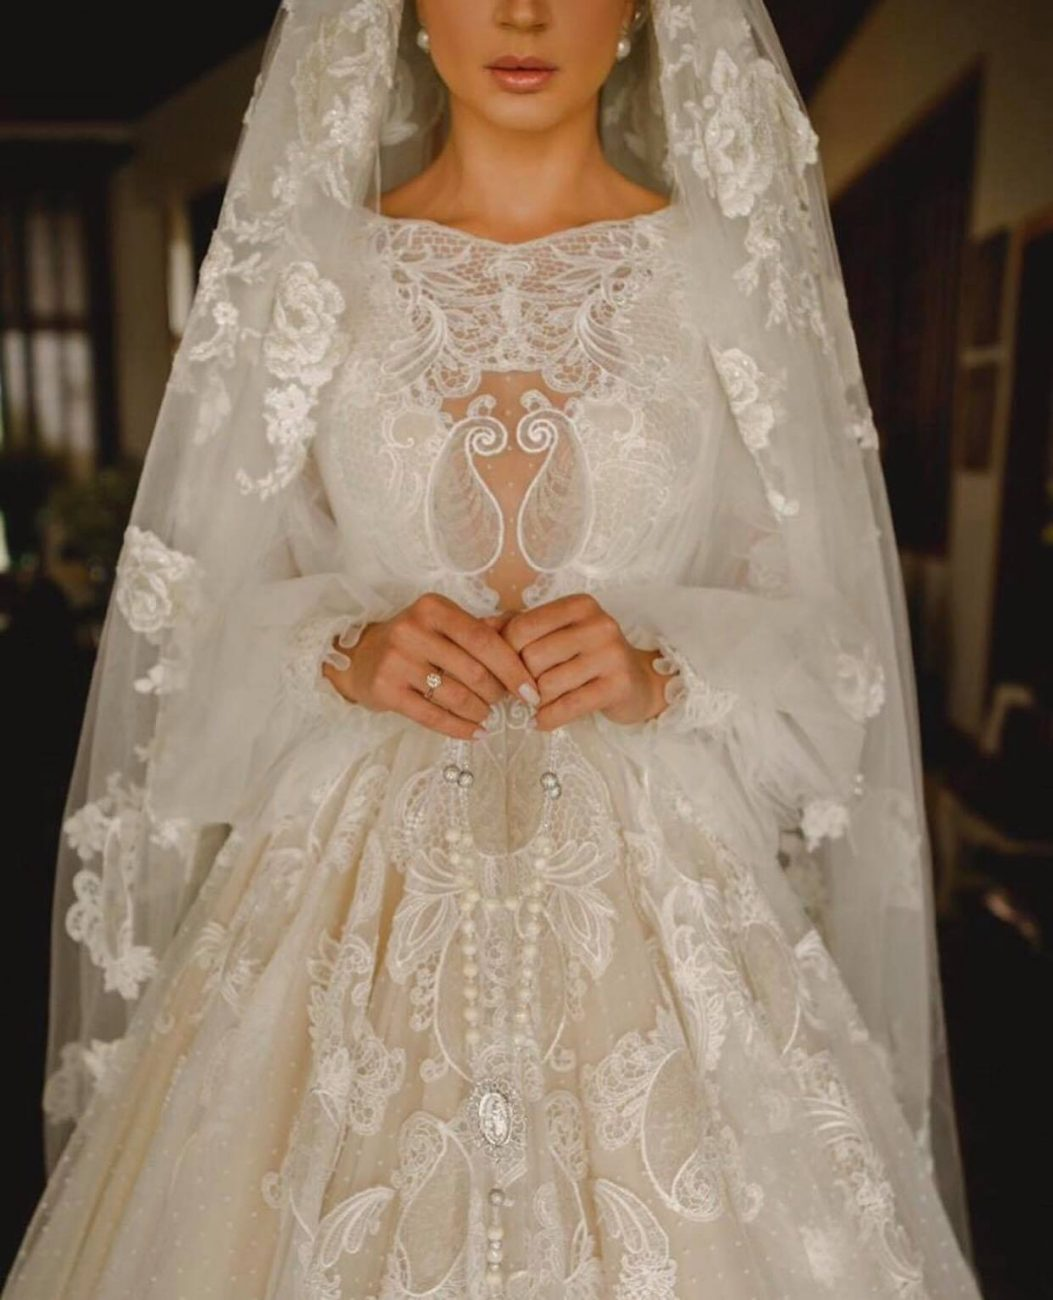 casamento religioso tássia naves e artur attie